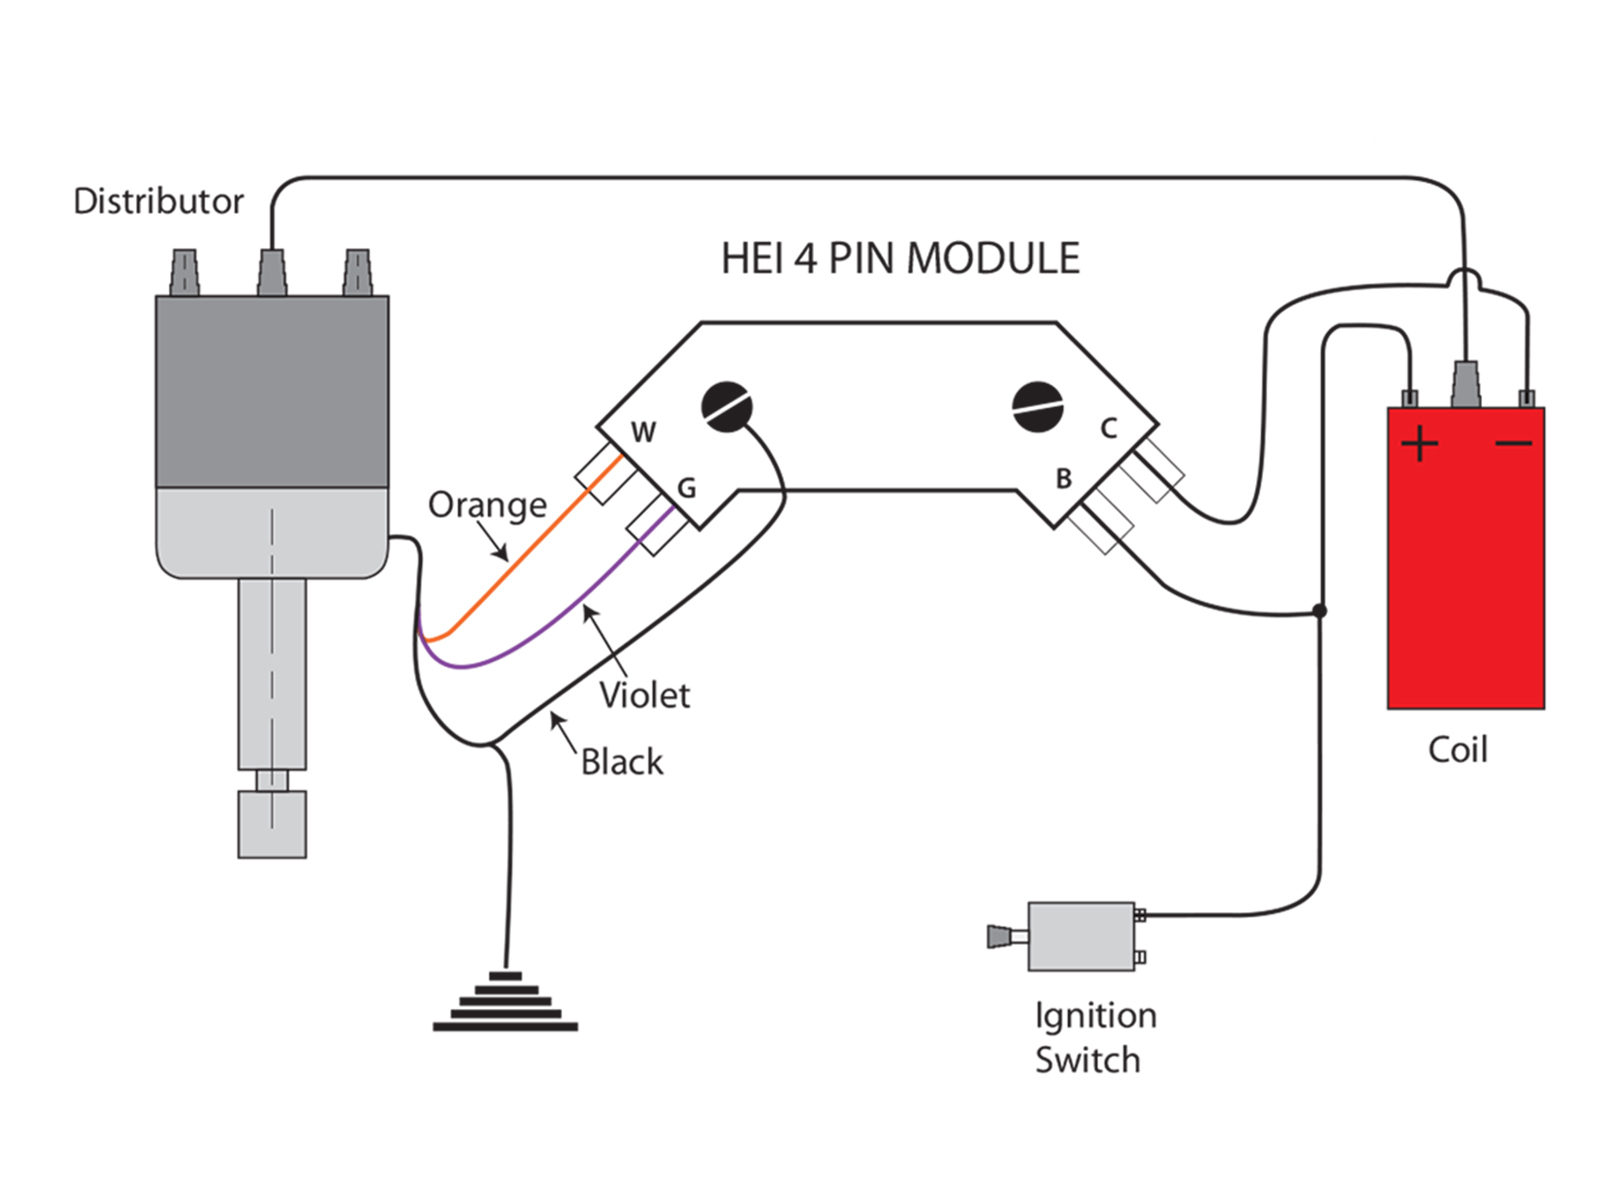 Hei Distributor Wire Diagram For Mopar | Manual E-Books - Hei Distributor Wiring Diagram